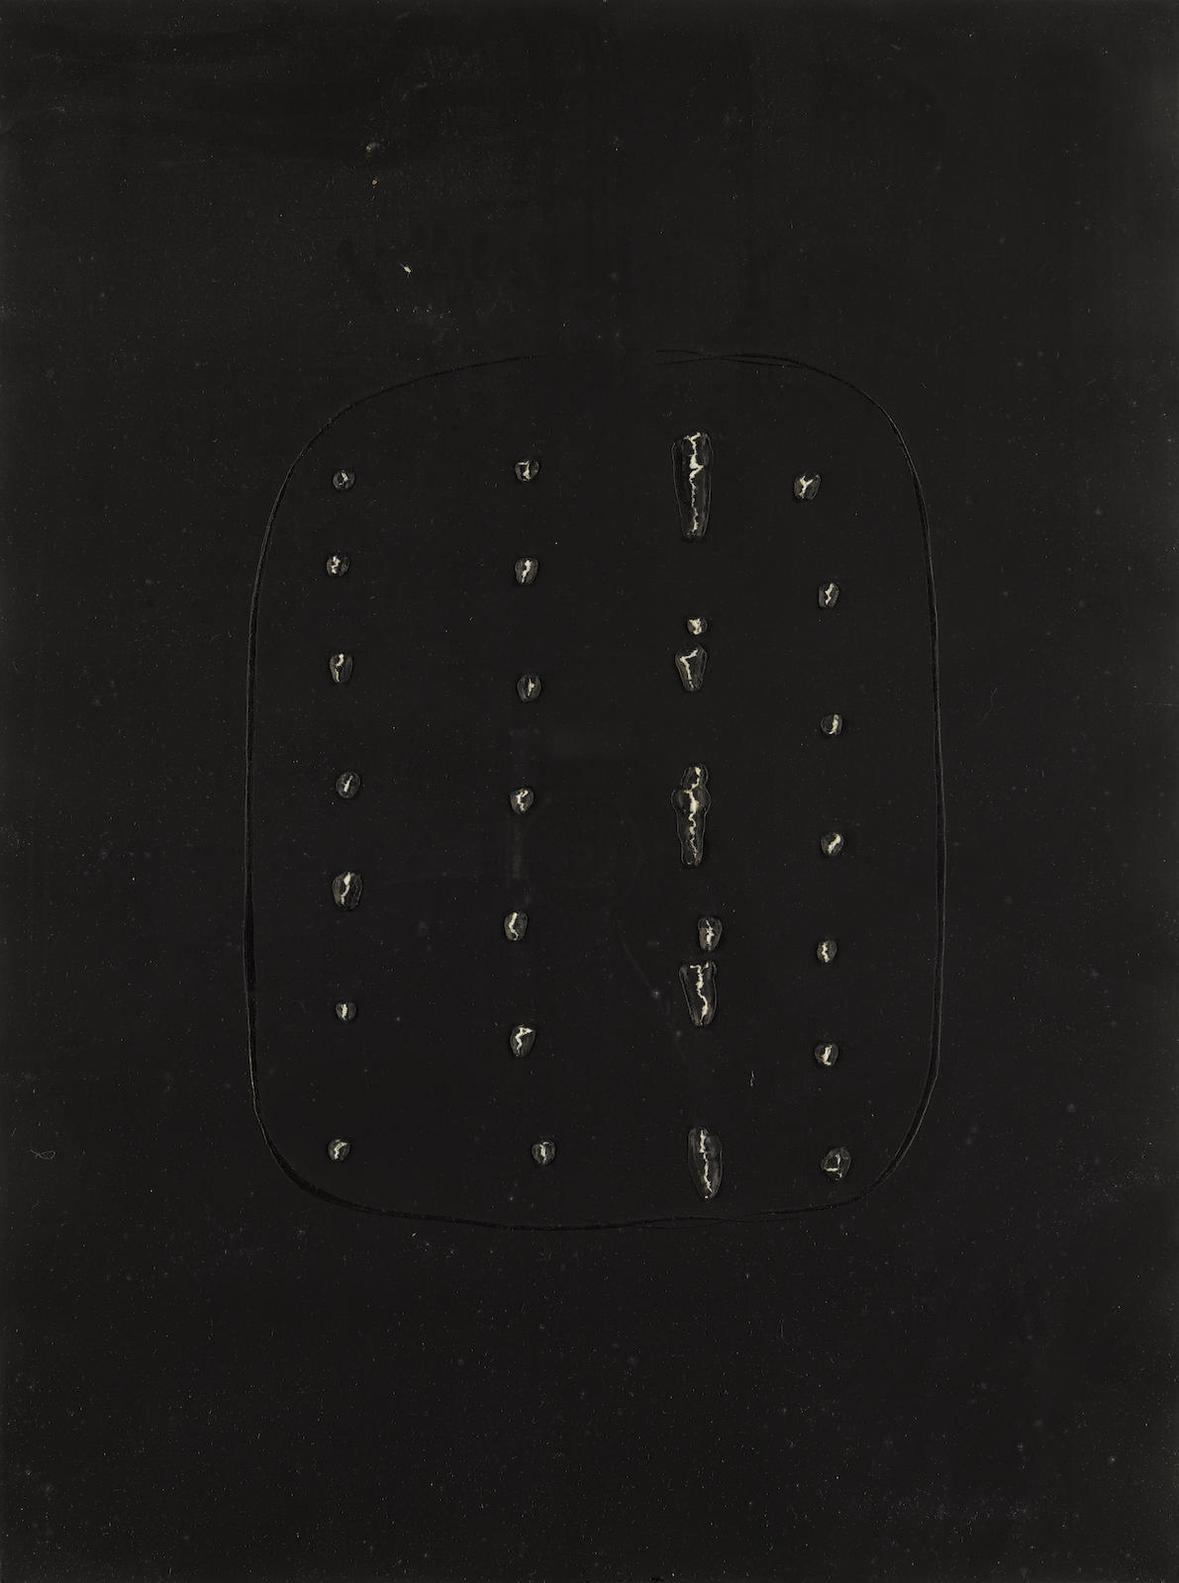 Lucio Fontana-Concetto Spaziale A-1968